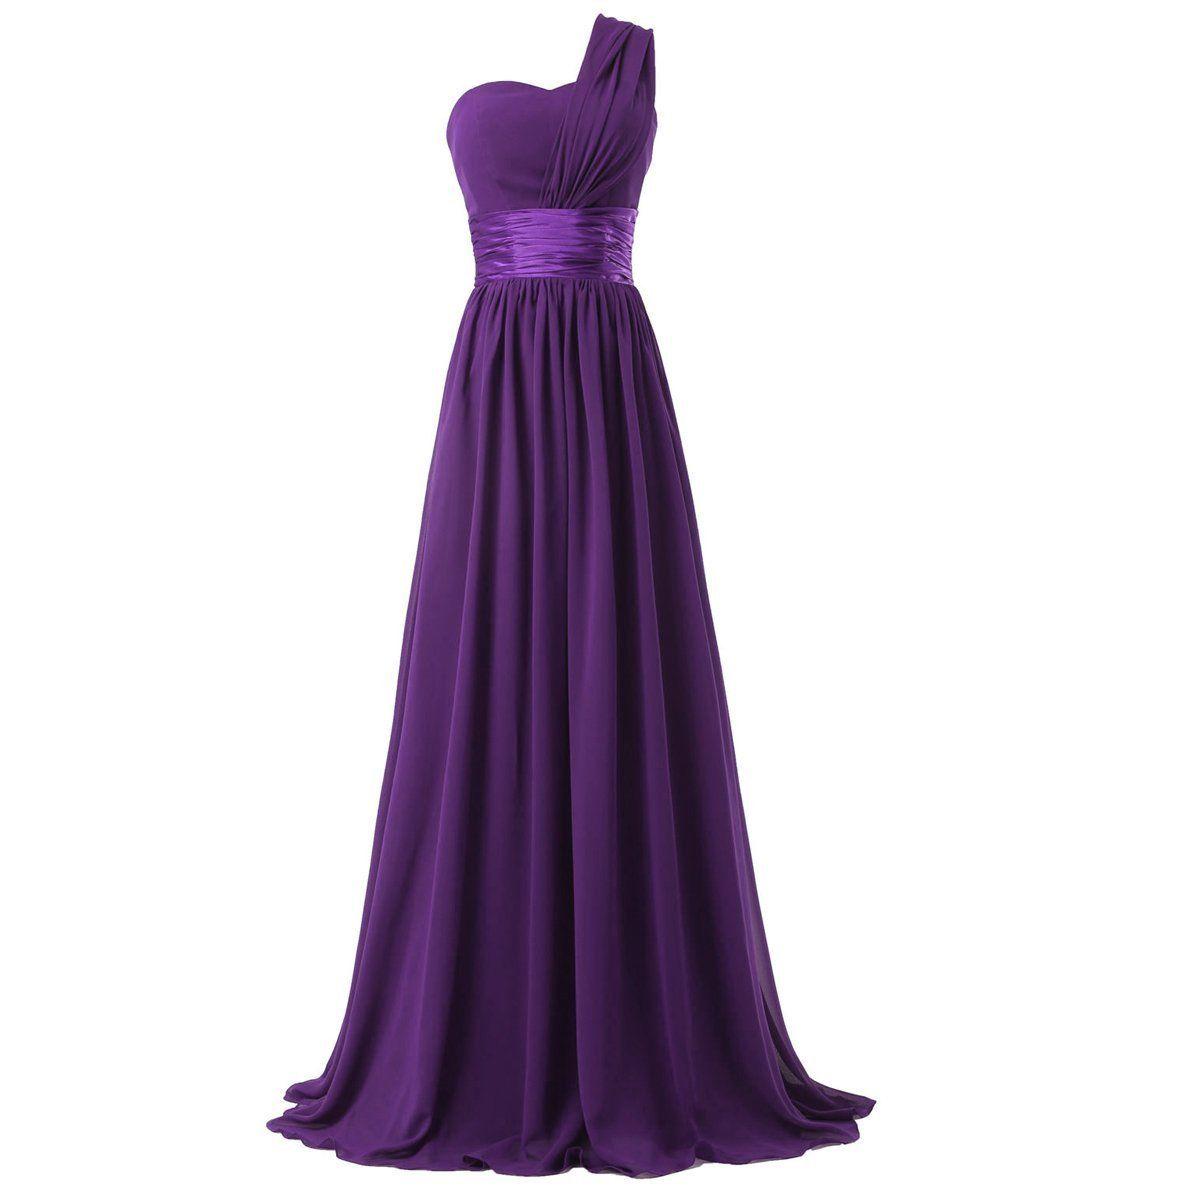 Oman Women\'s Chiffon One Shoulder Bridesmaids Dresses Small Purple ...